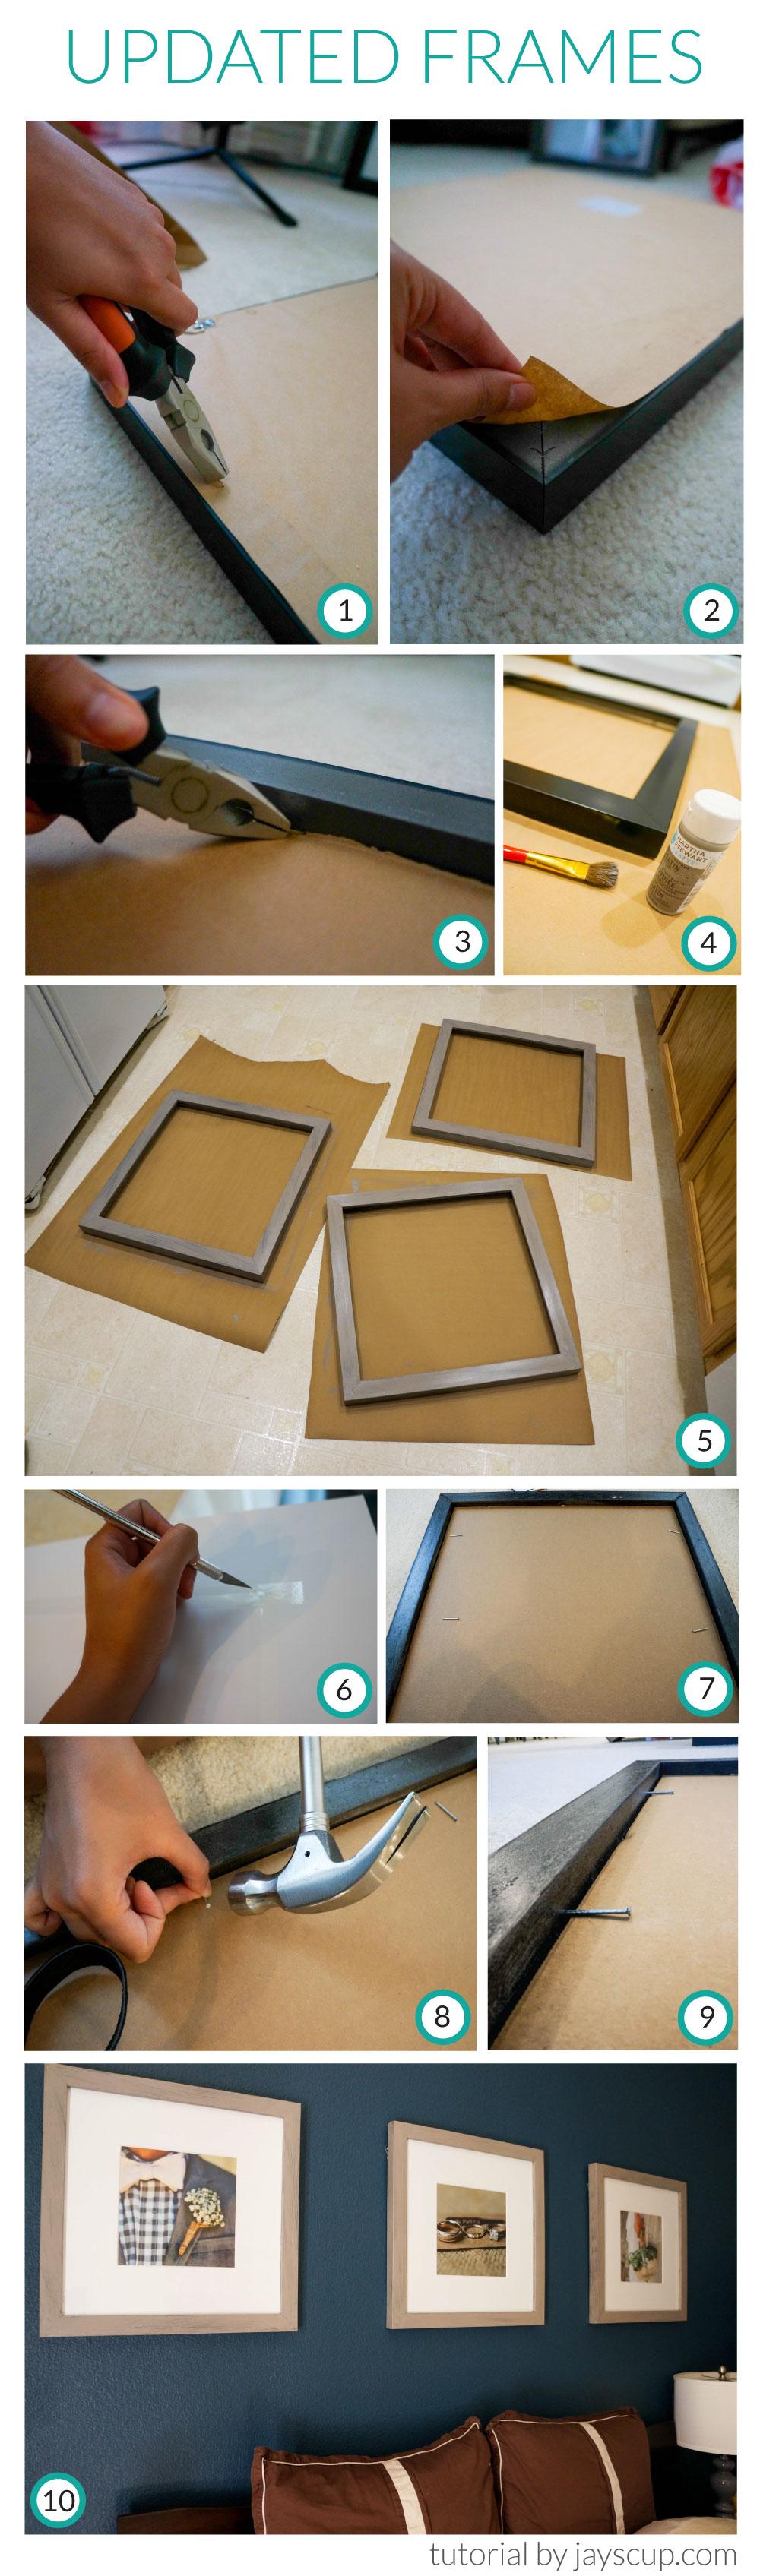 Updated Frames